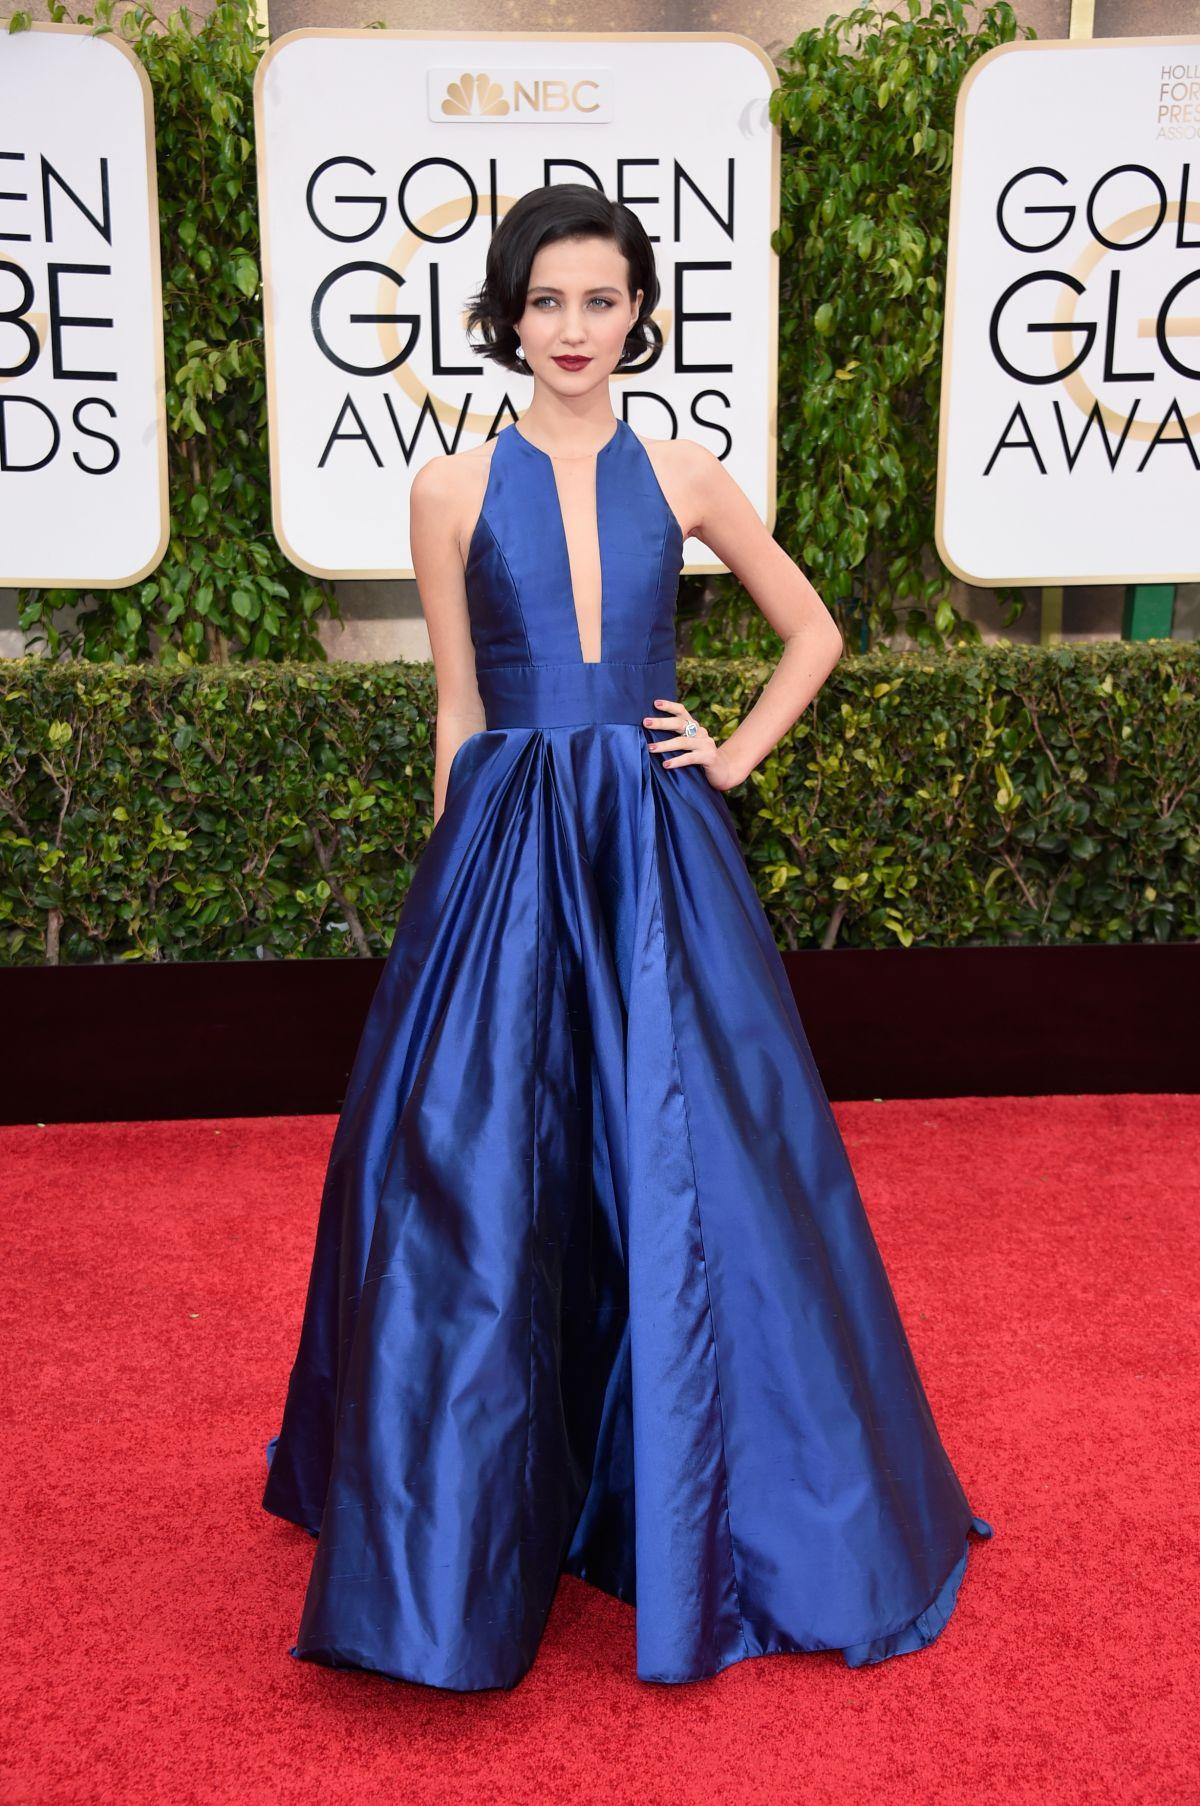 JULIA GOLDANI TELLES at 2015 Golden Globe Awards in Beverly Hills